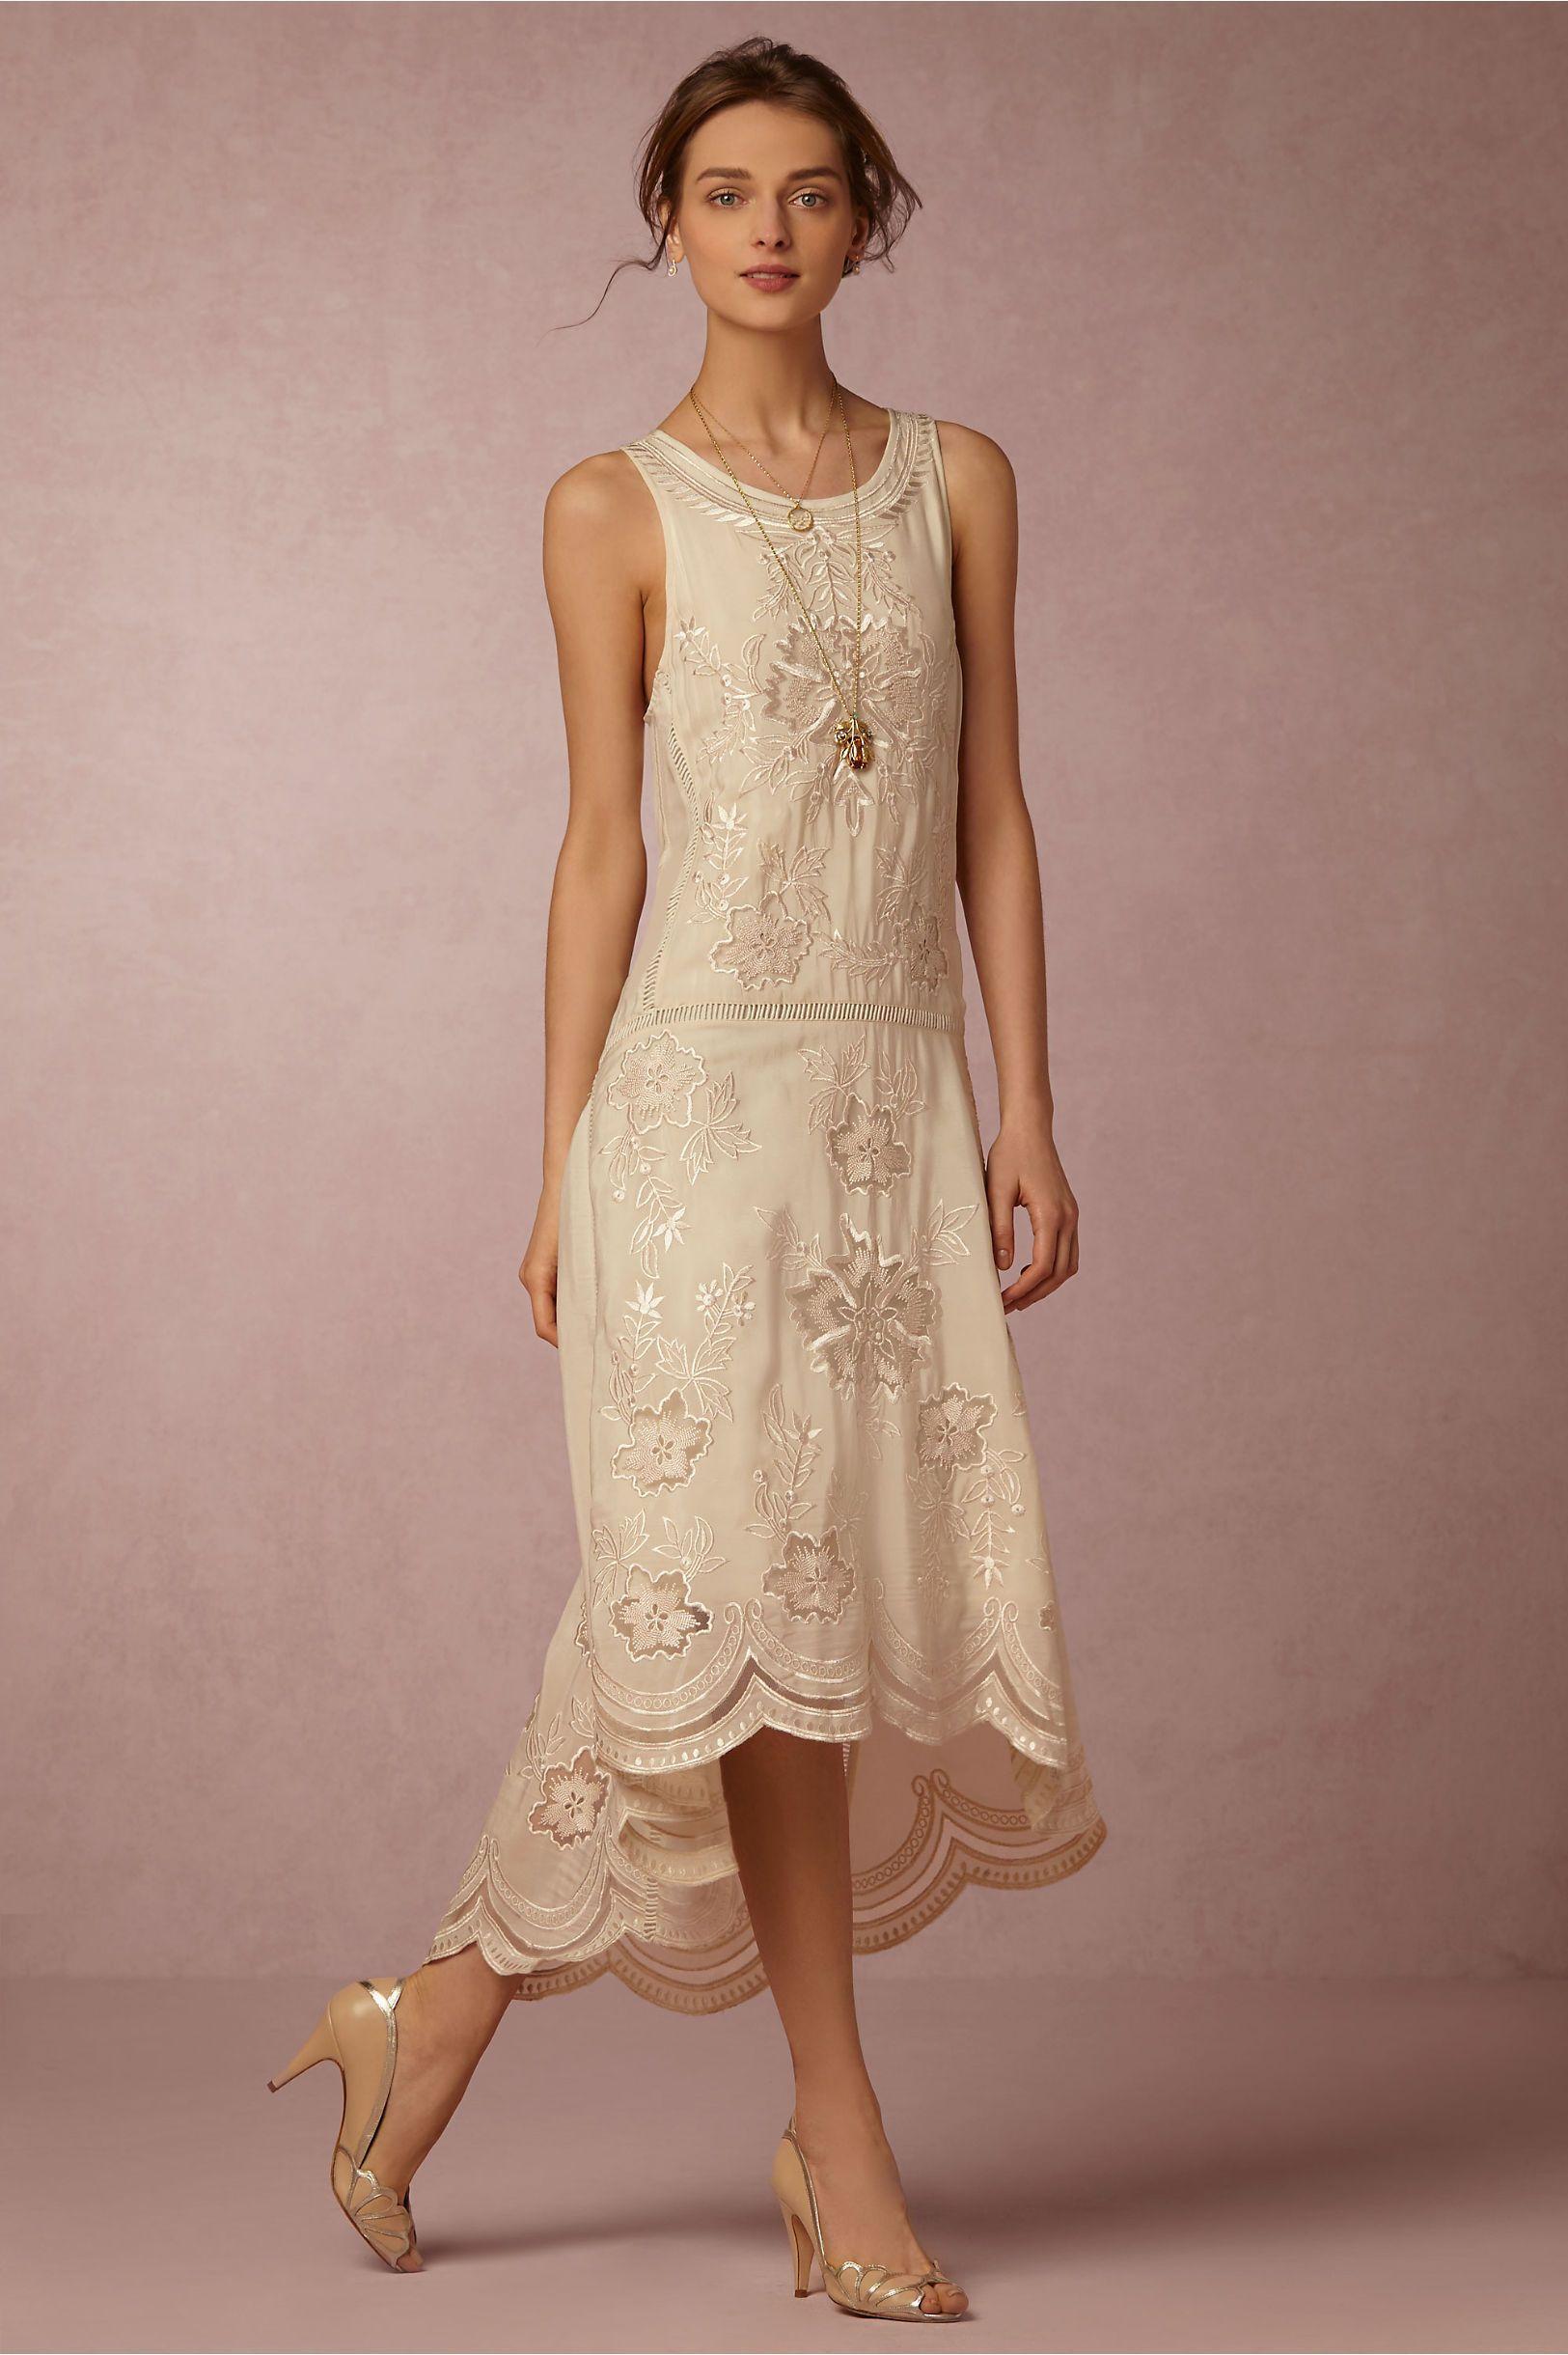 044eba9459c Image result for 1920 mother of the bride dress